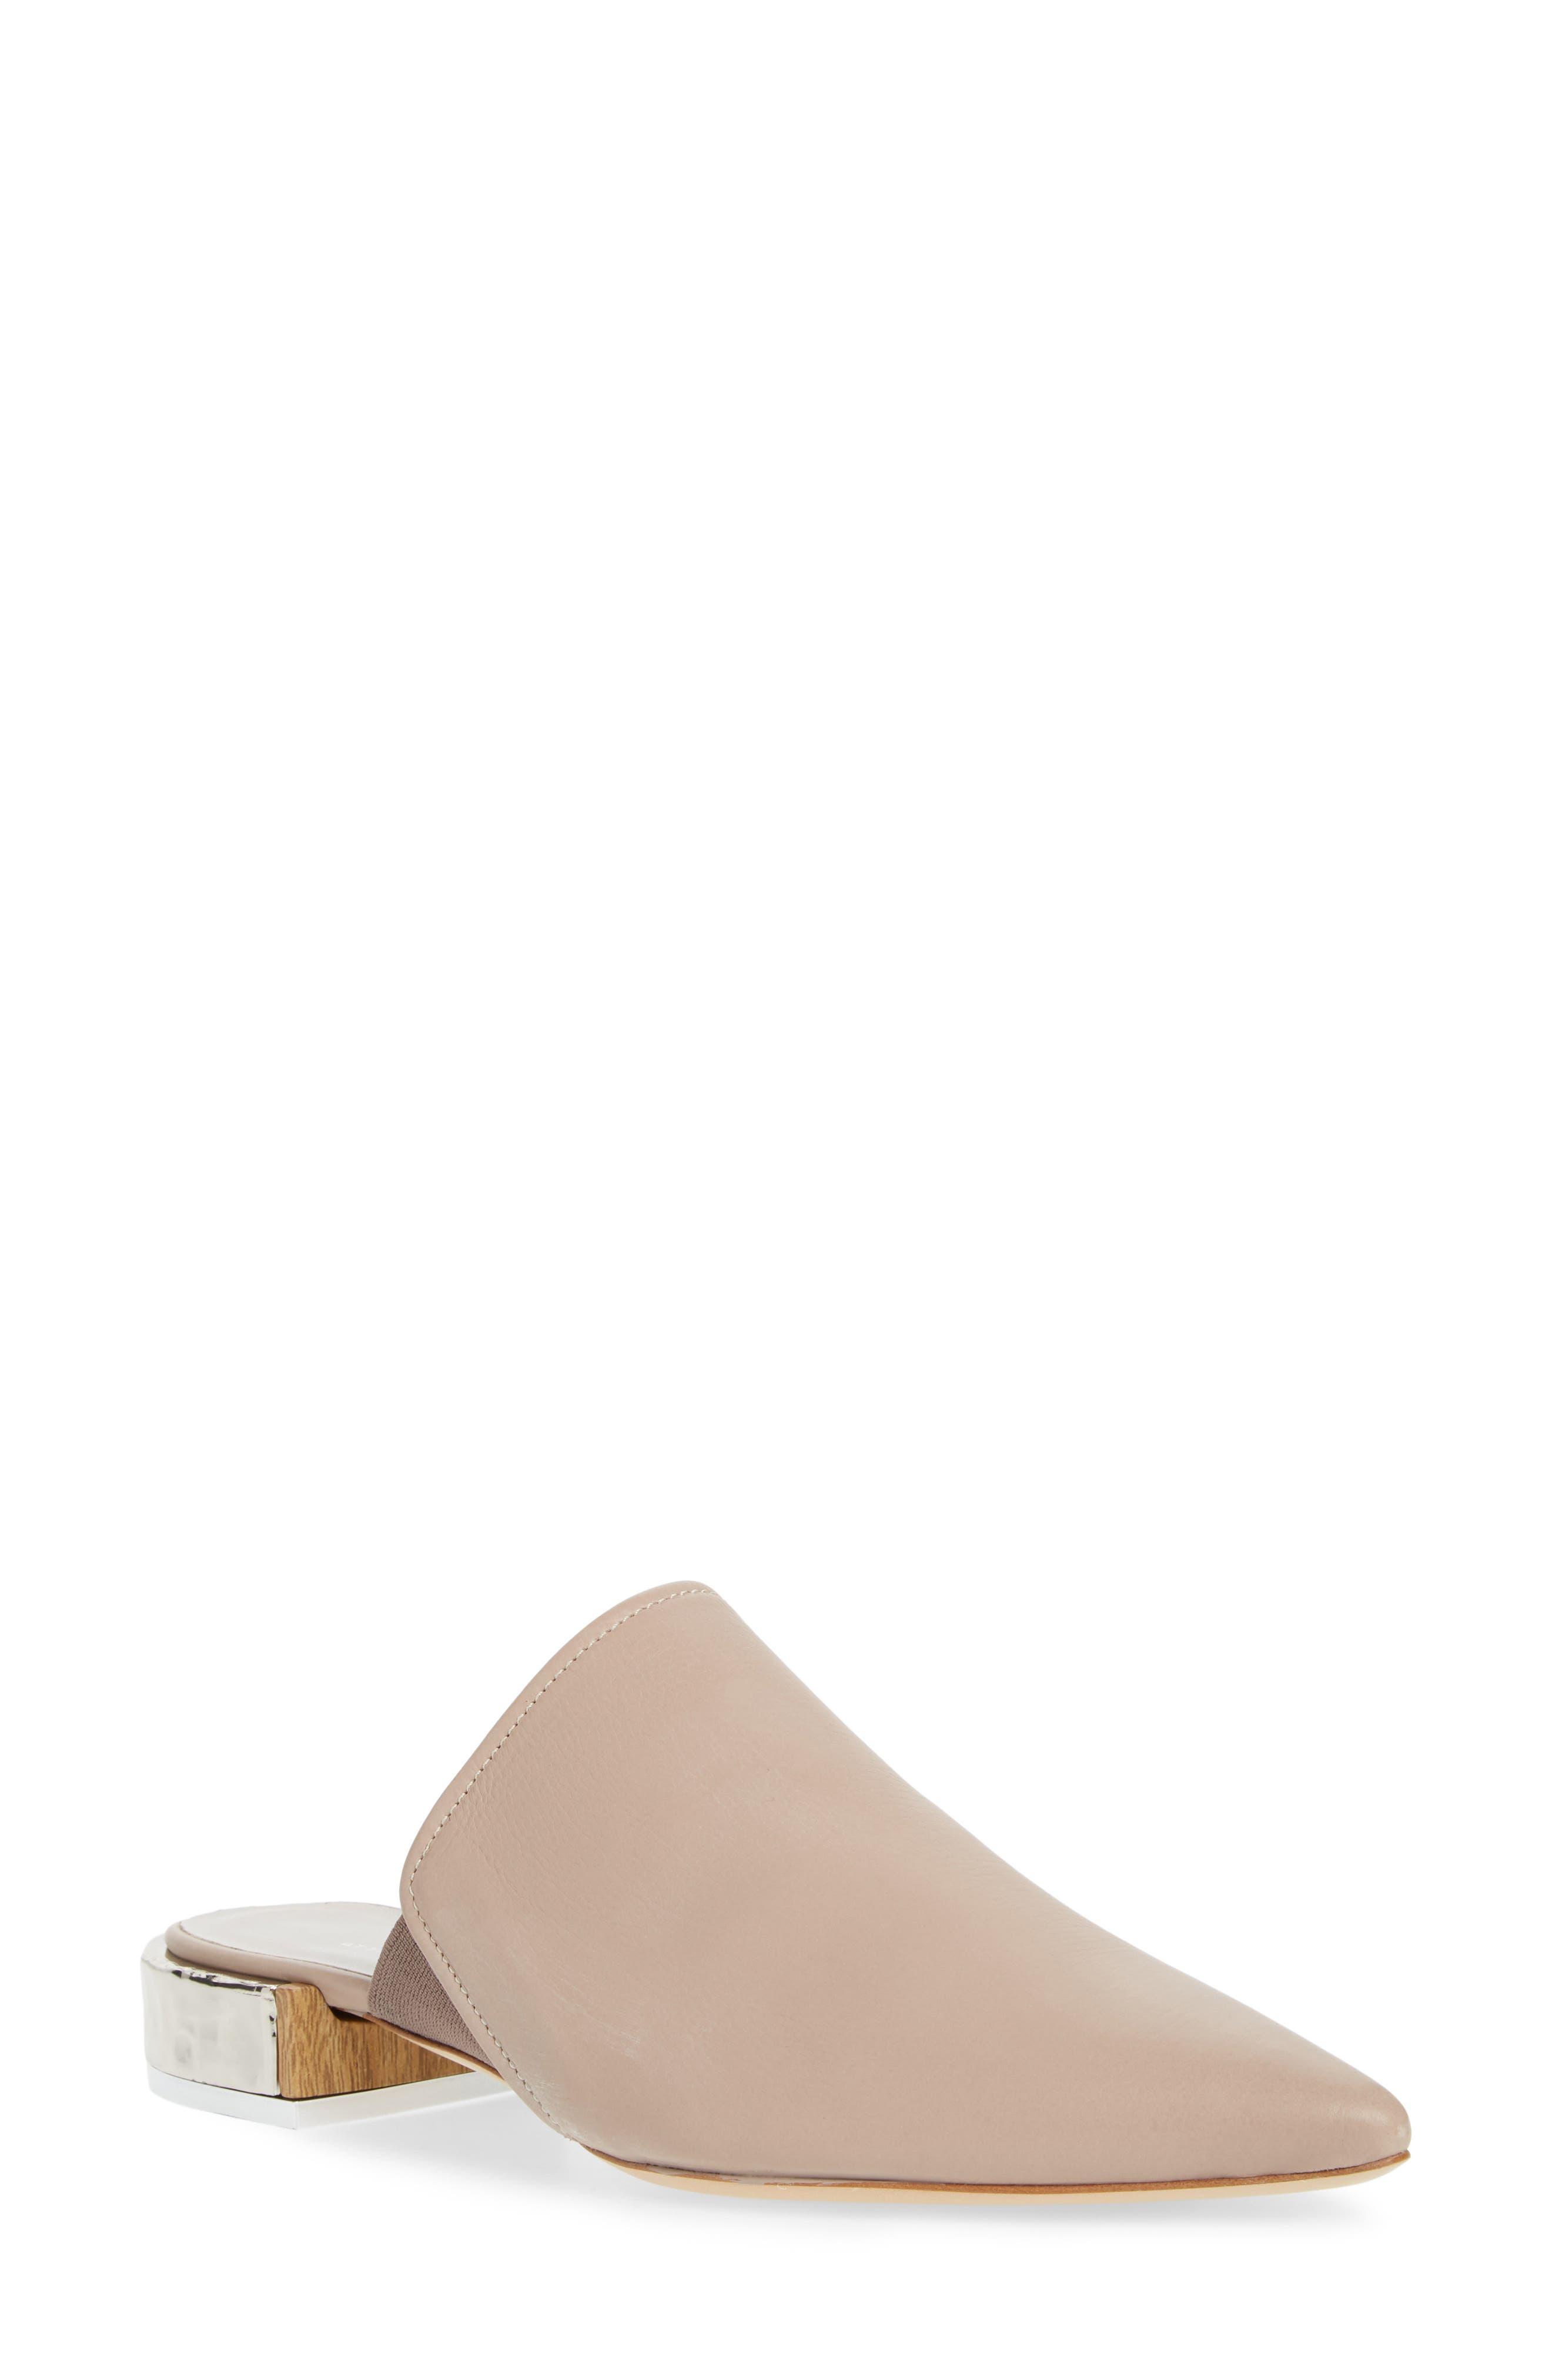 Agl Pointed Toe Mule - Beige